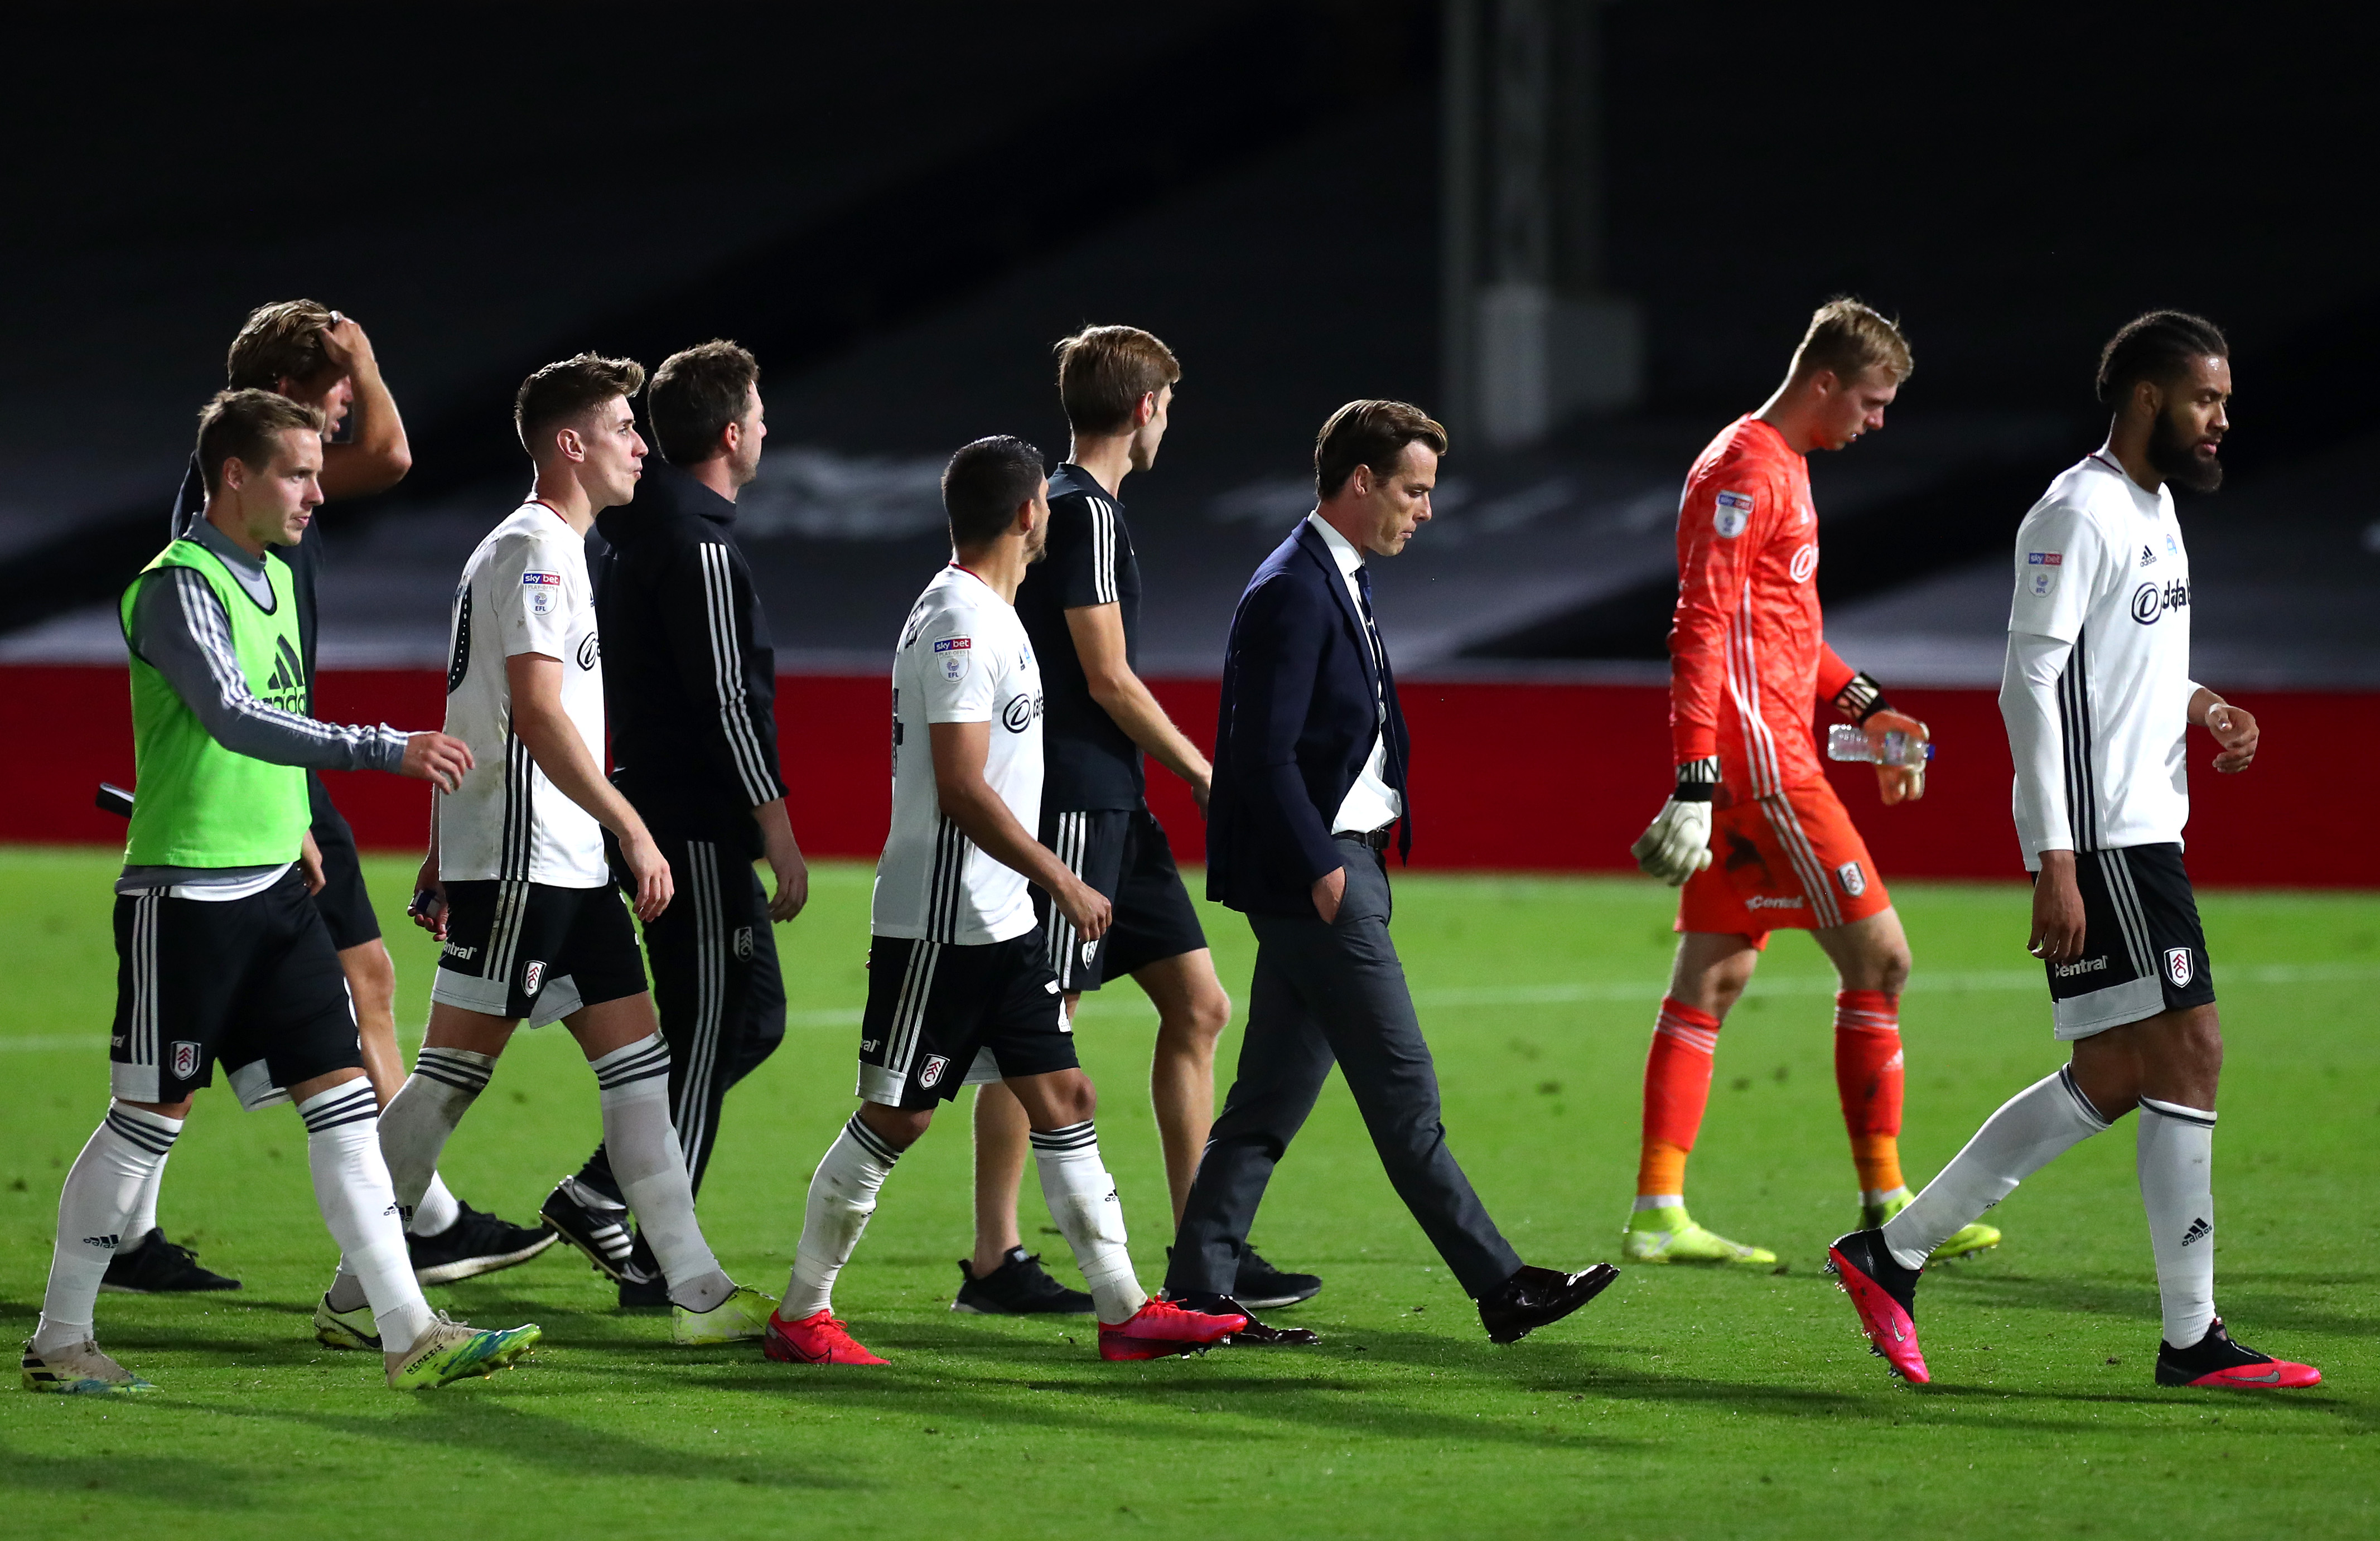 Fulham v Cardiff City - Sky Bet Championship Play Off Semi-final 2nd Leg